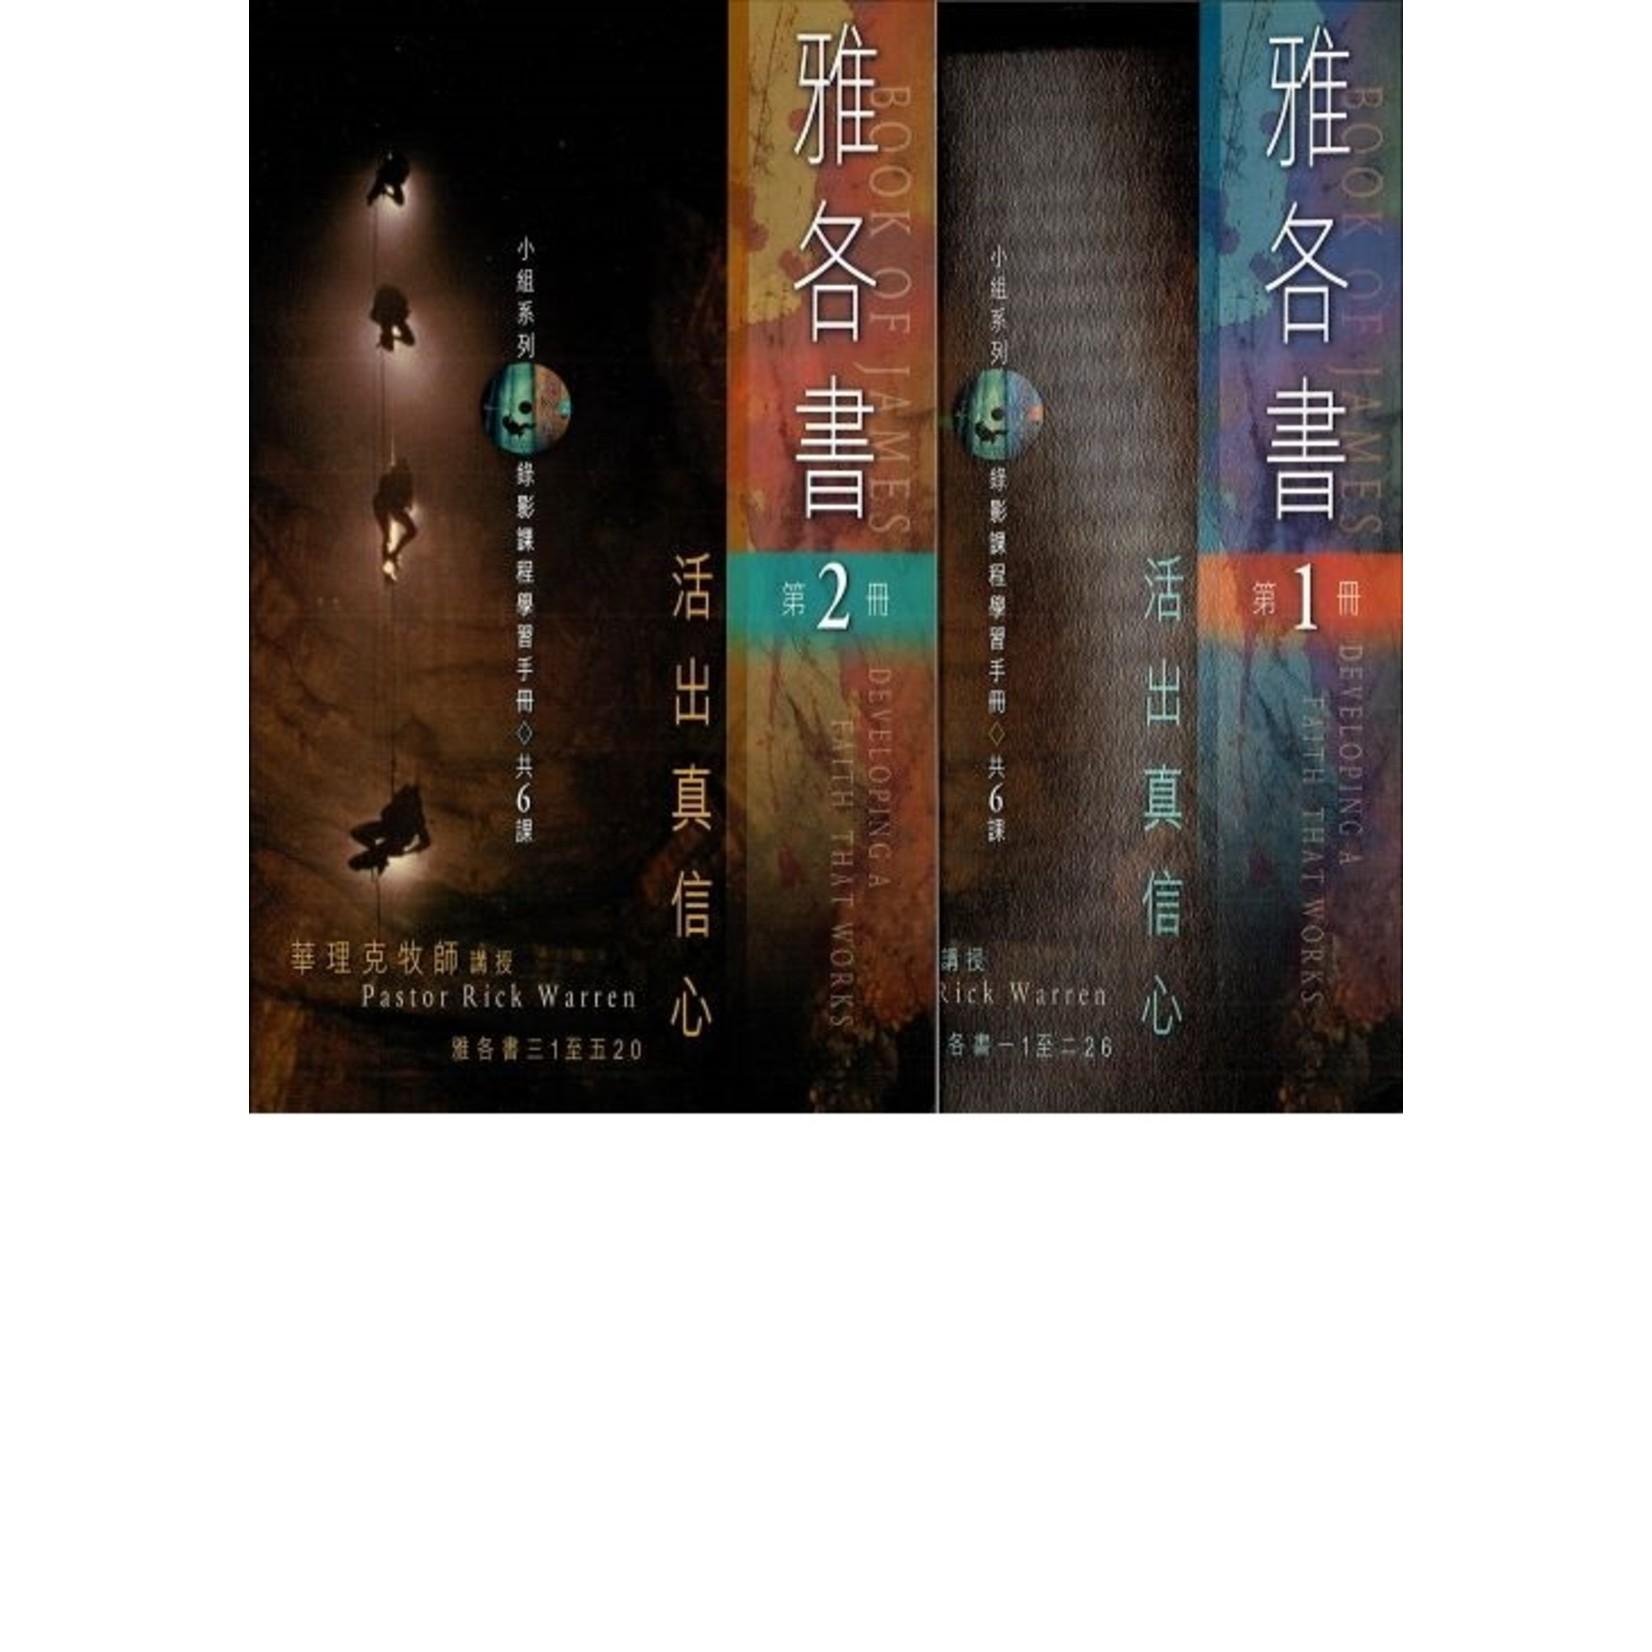 福音證主協會 Christian Communication Inc 雅各書:活出真信心(全套2冊) Developing A Faith that Works Book of JAMES (2 books)